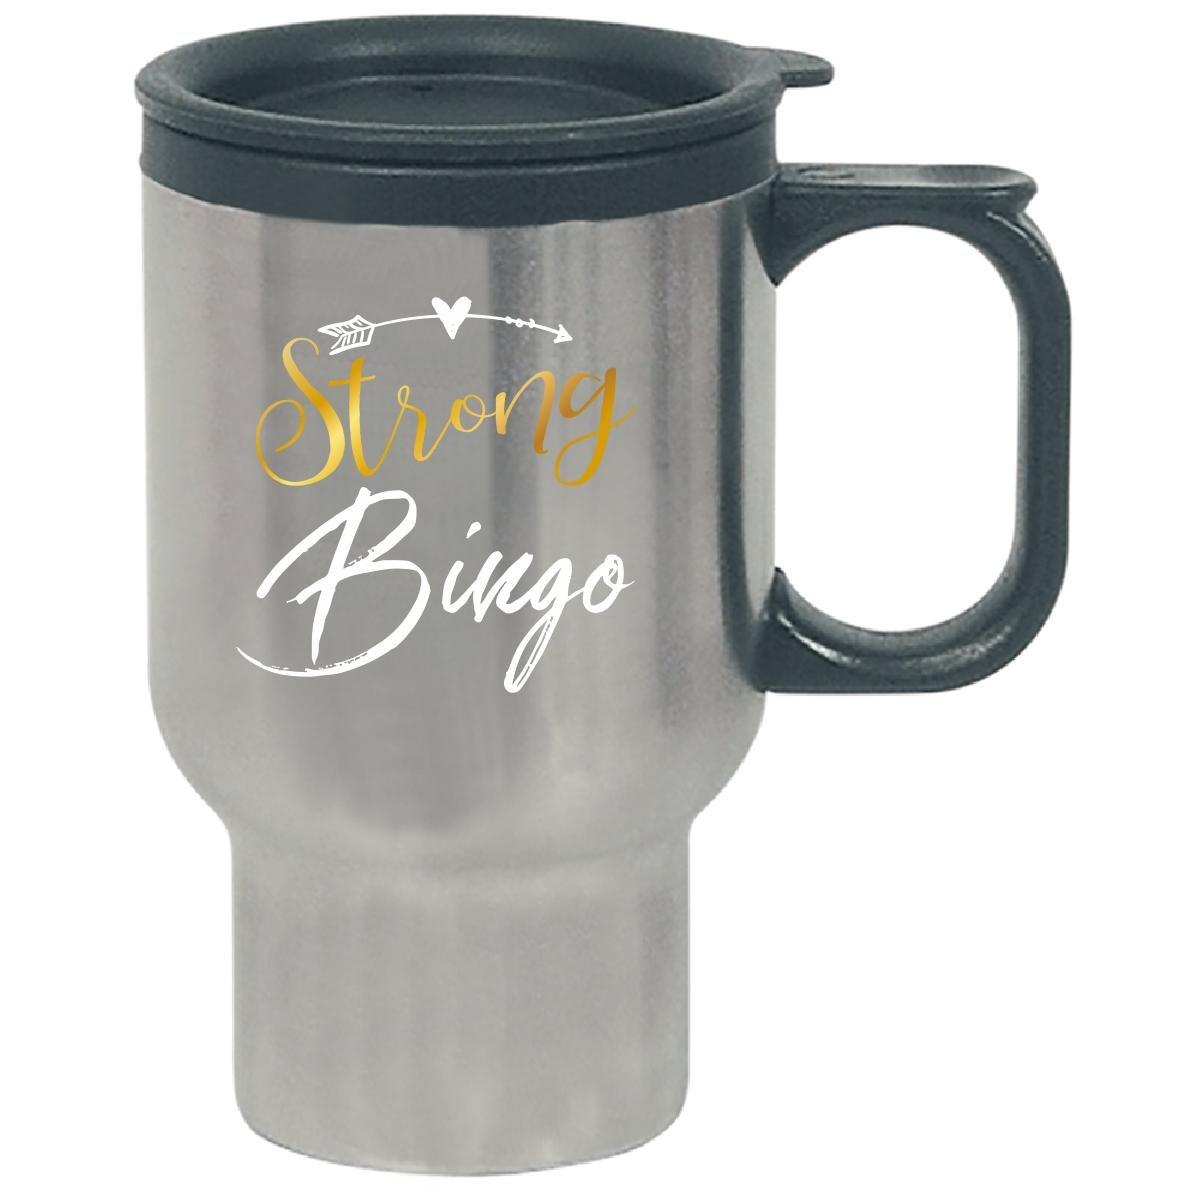 Strong Bingo Name Gift Mothers Day Present Grandma - Travel Mug by My Family Tee